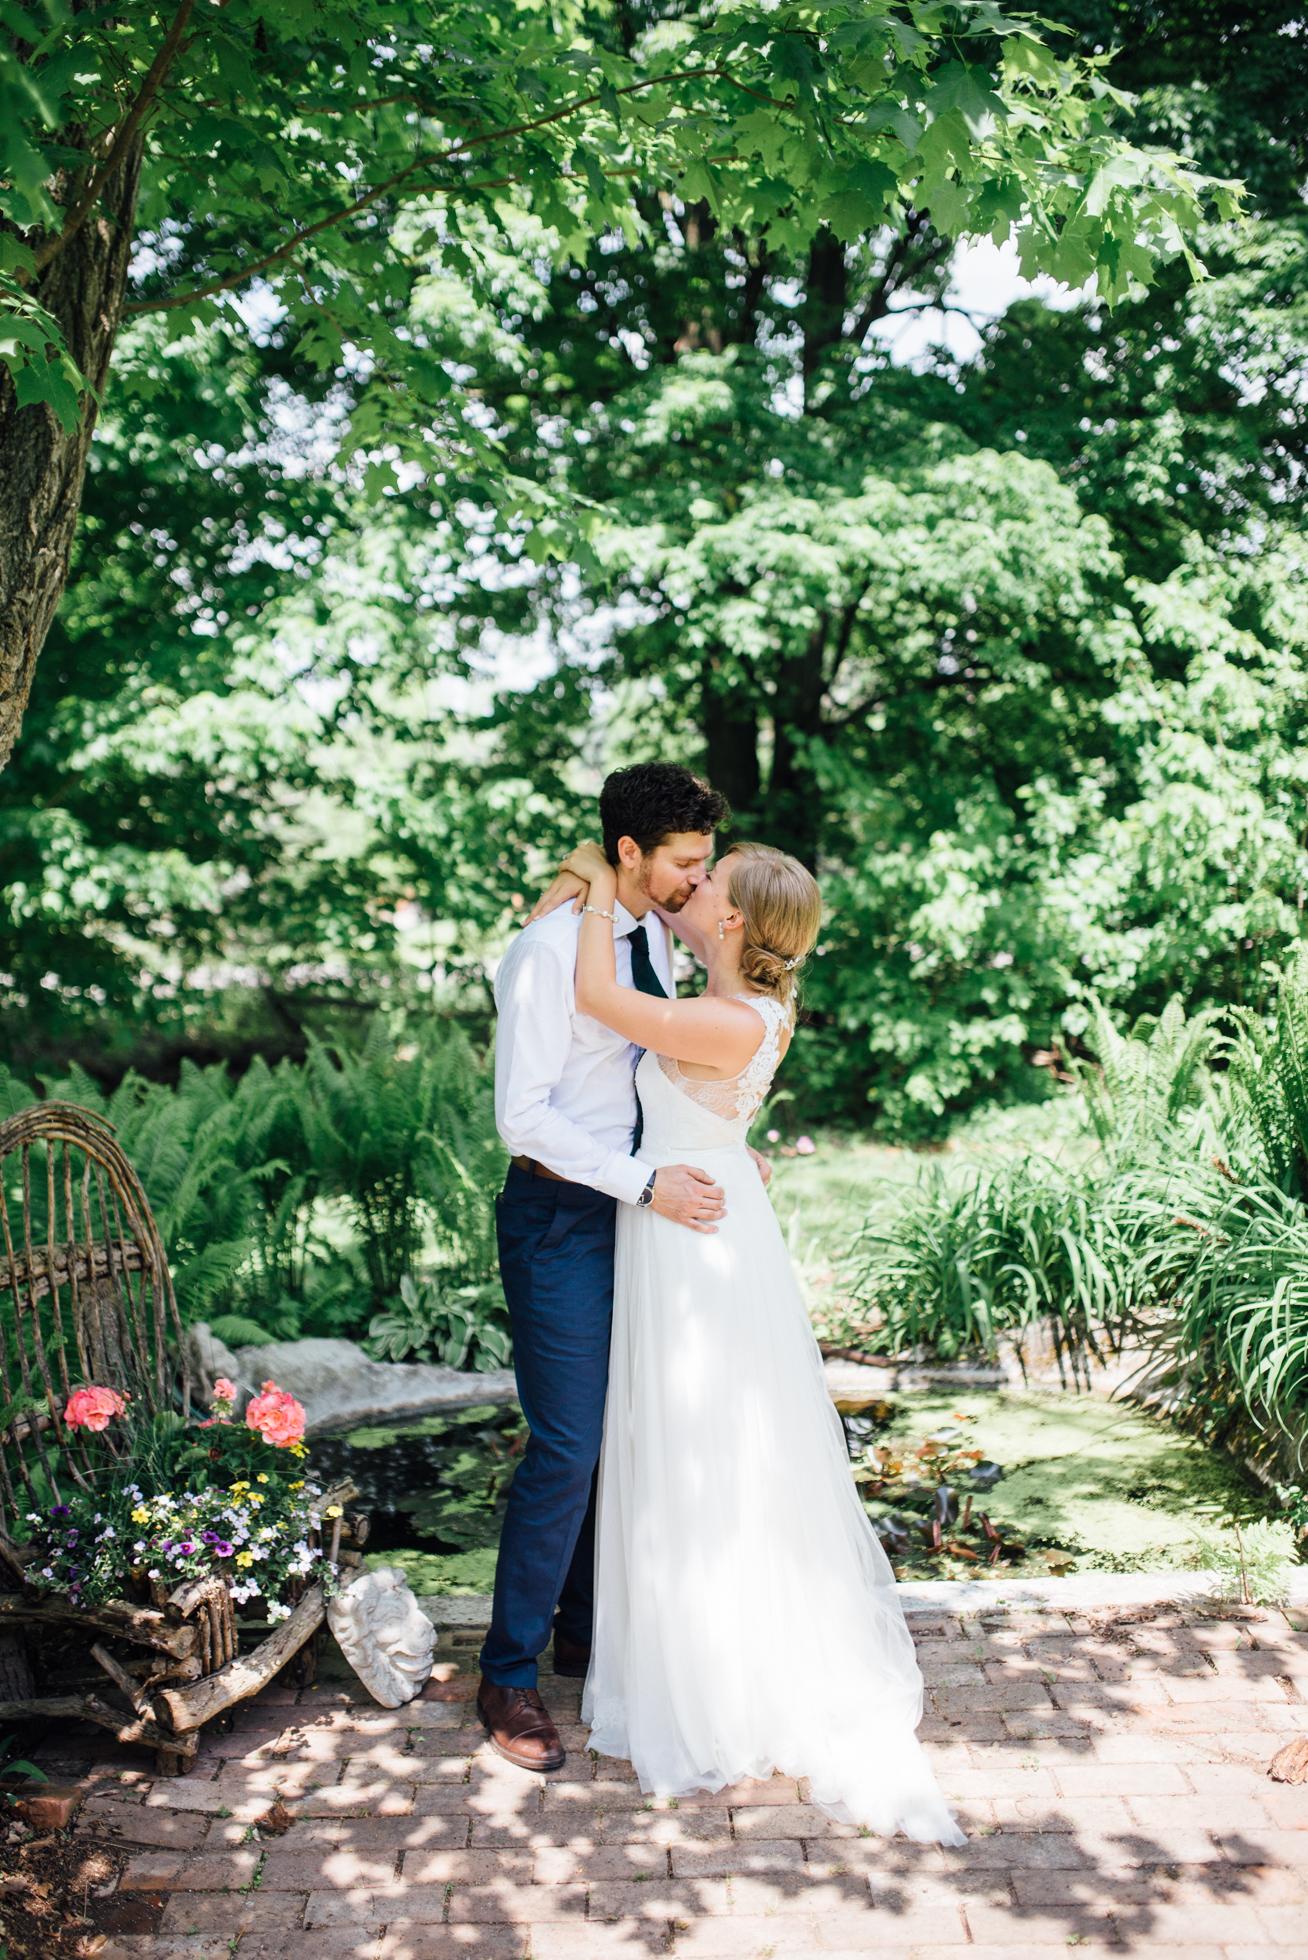 Outdoor-Caledon-Tralee-Wedding-Photography-35